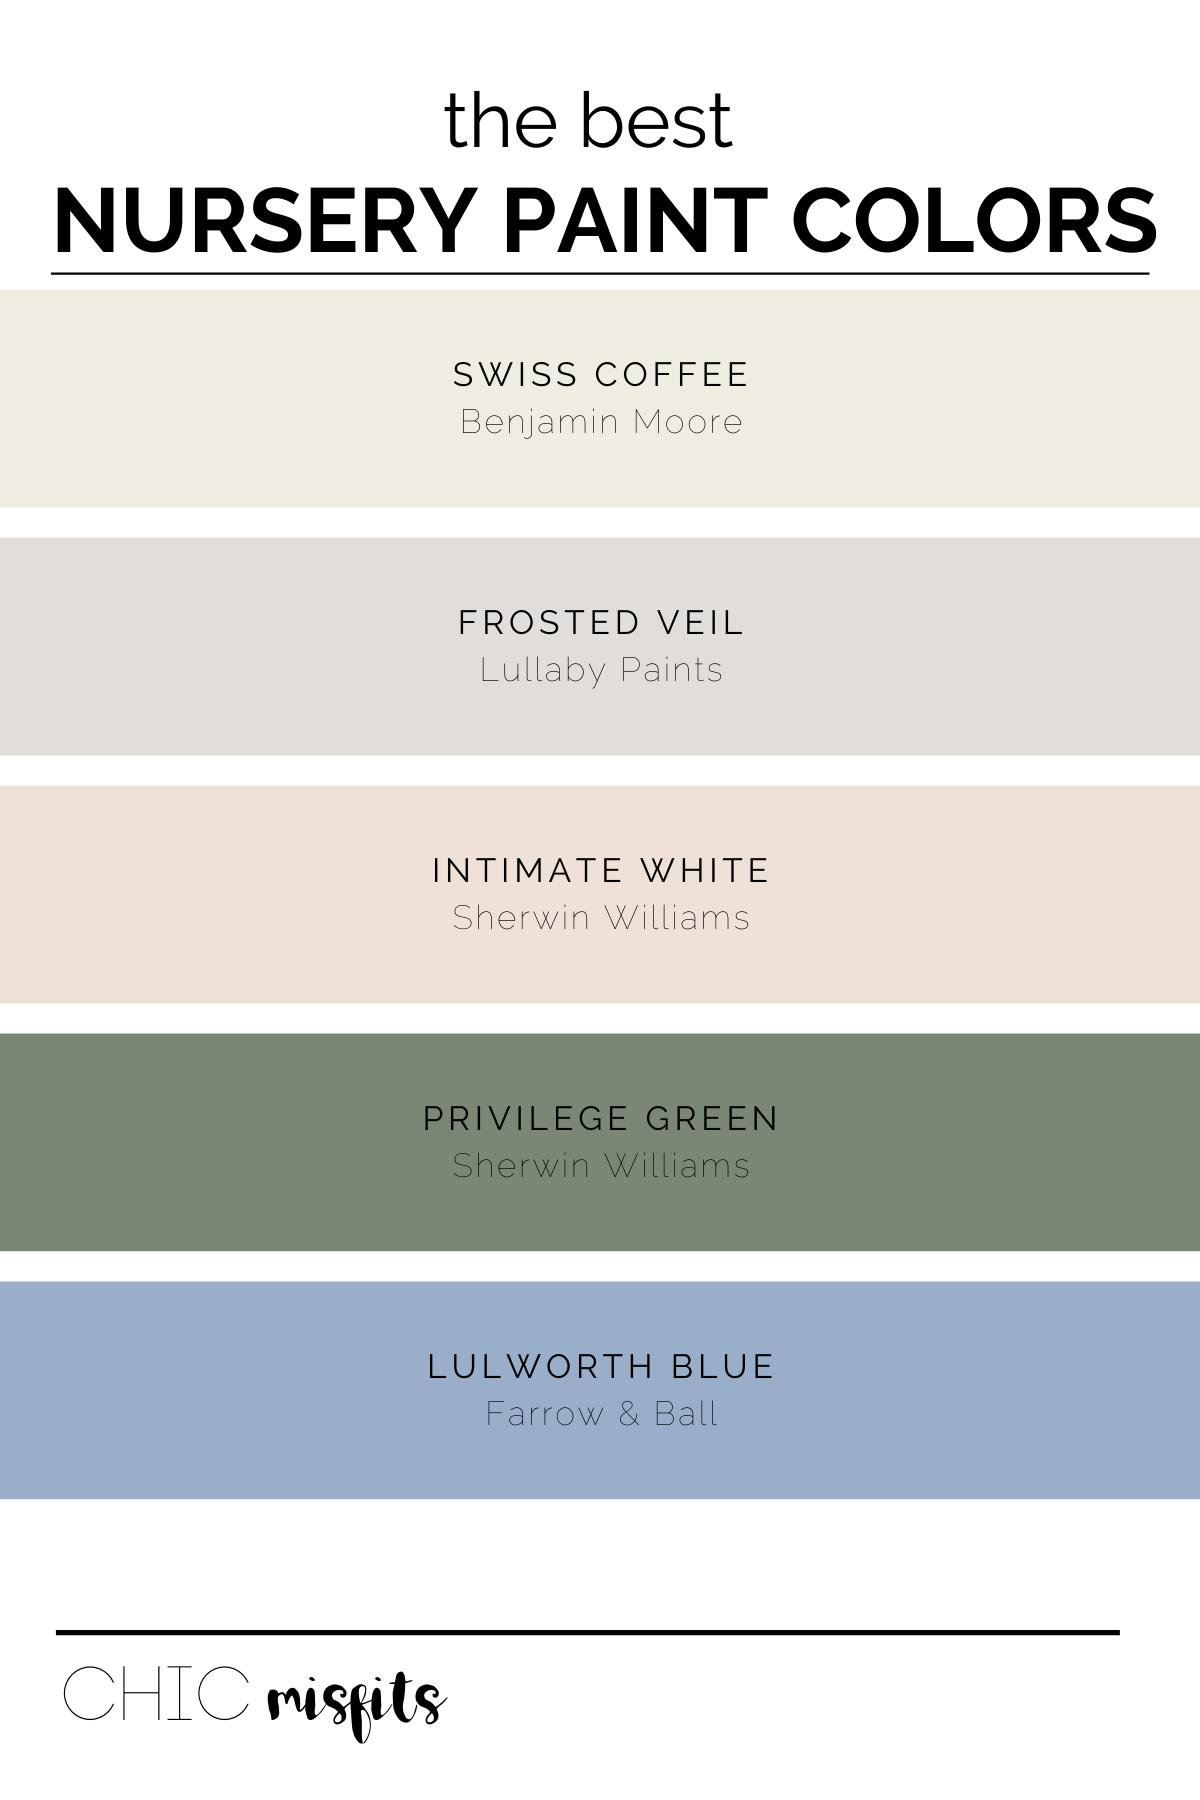 5 Of The Best Nursery Paint Colors Chic Misfits Nursery Paint Colors Nursery Paintings Gender Neutral Nursery Colors